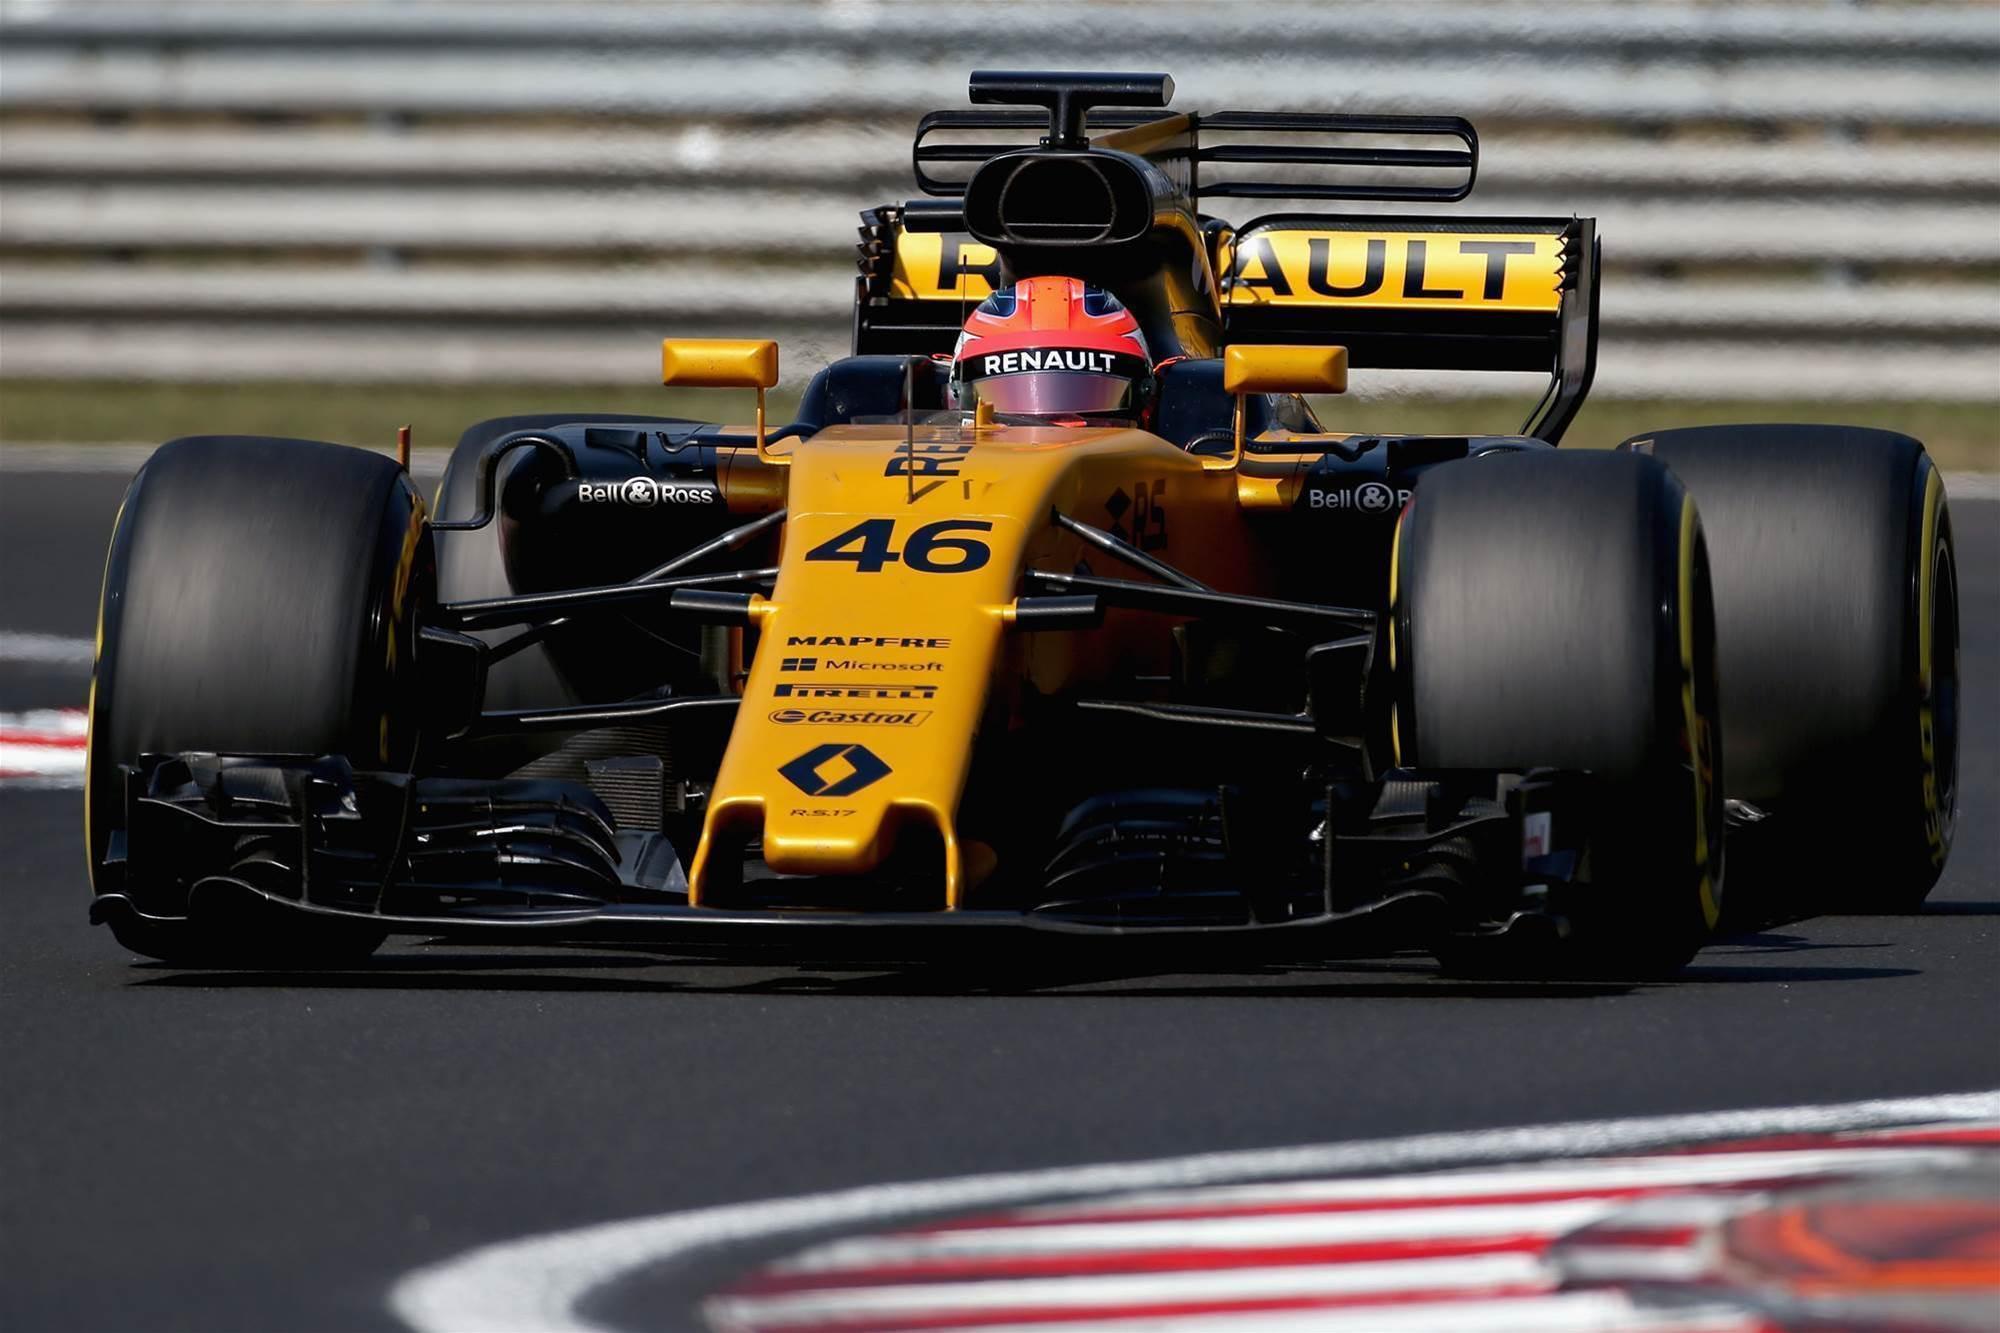 Pic gallery: Robert Kubica's Hungary F1 test